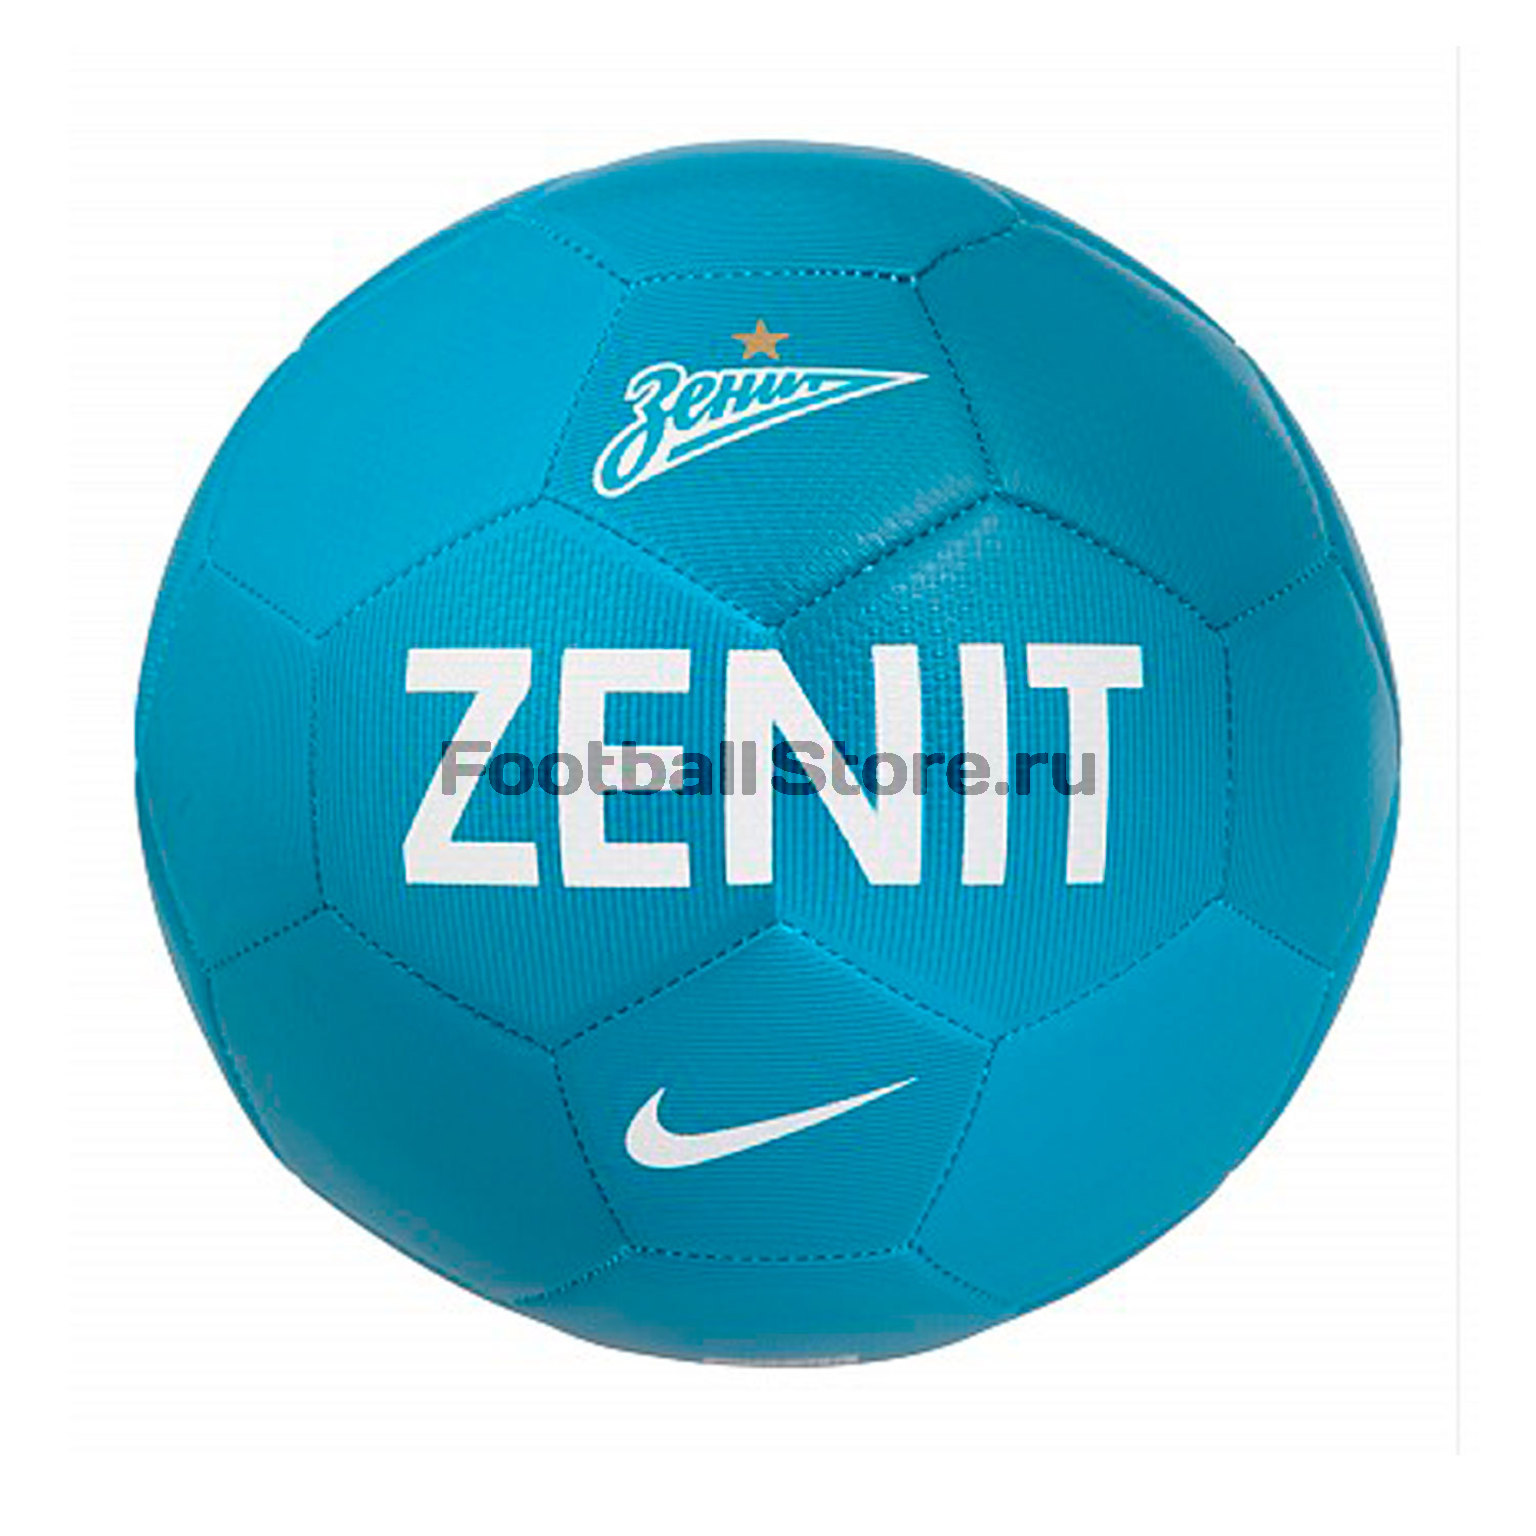 Zenit Nike Мяч Nike Prestige Zenit SC3005-498-4